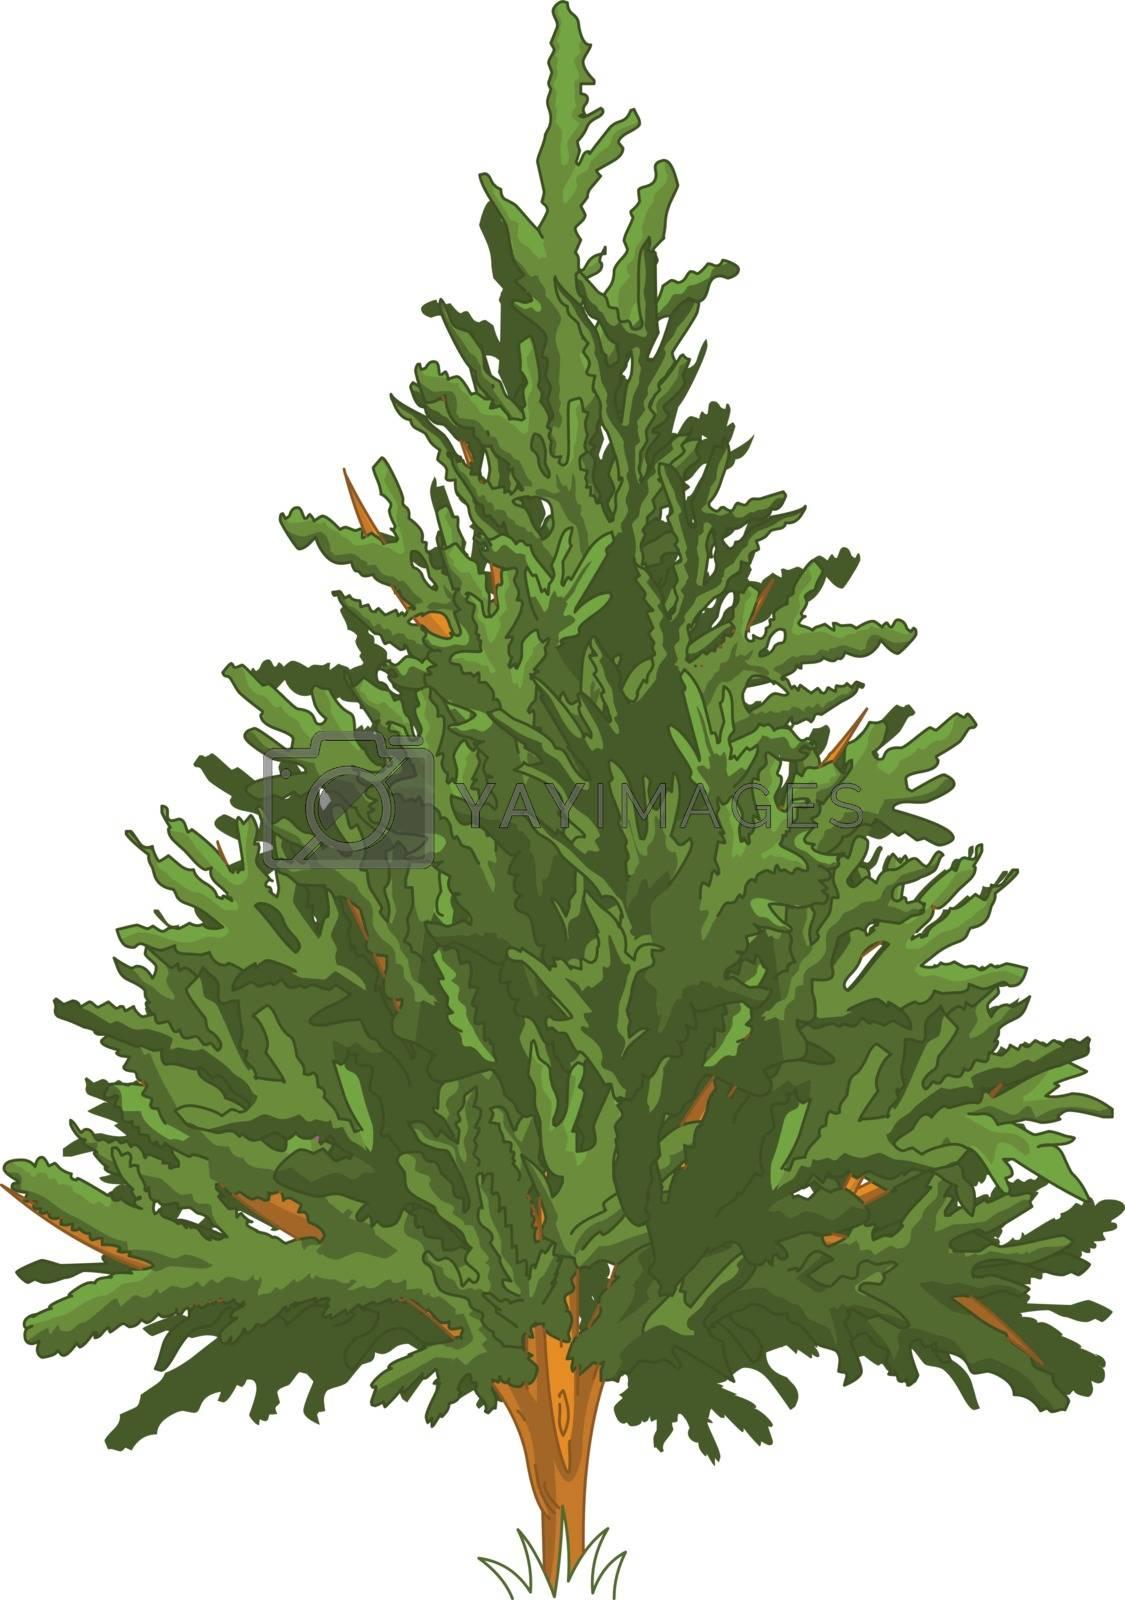 Royalty free image of Pine Tree by Dazdraperma